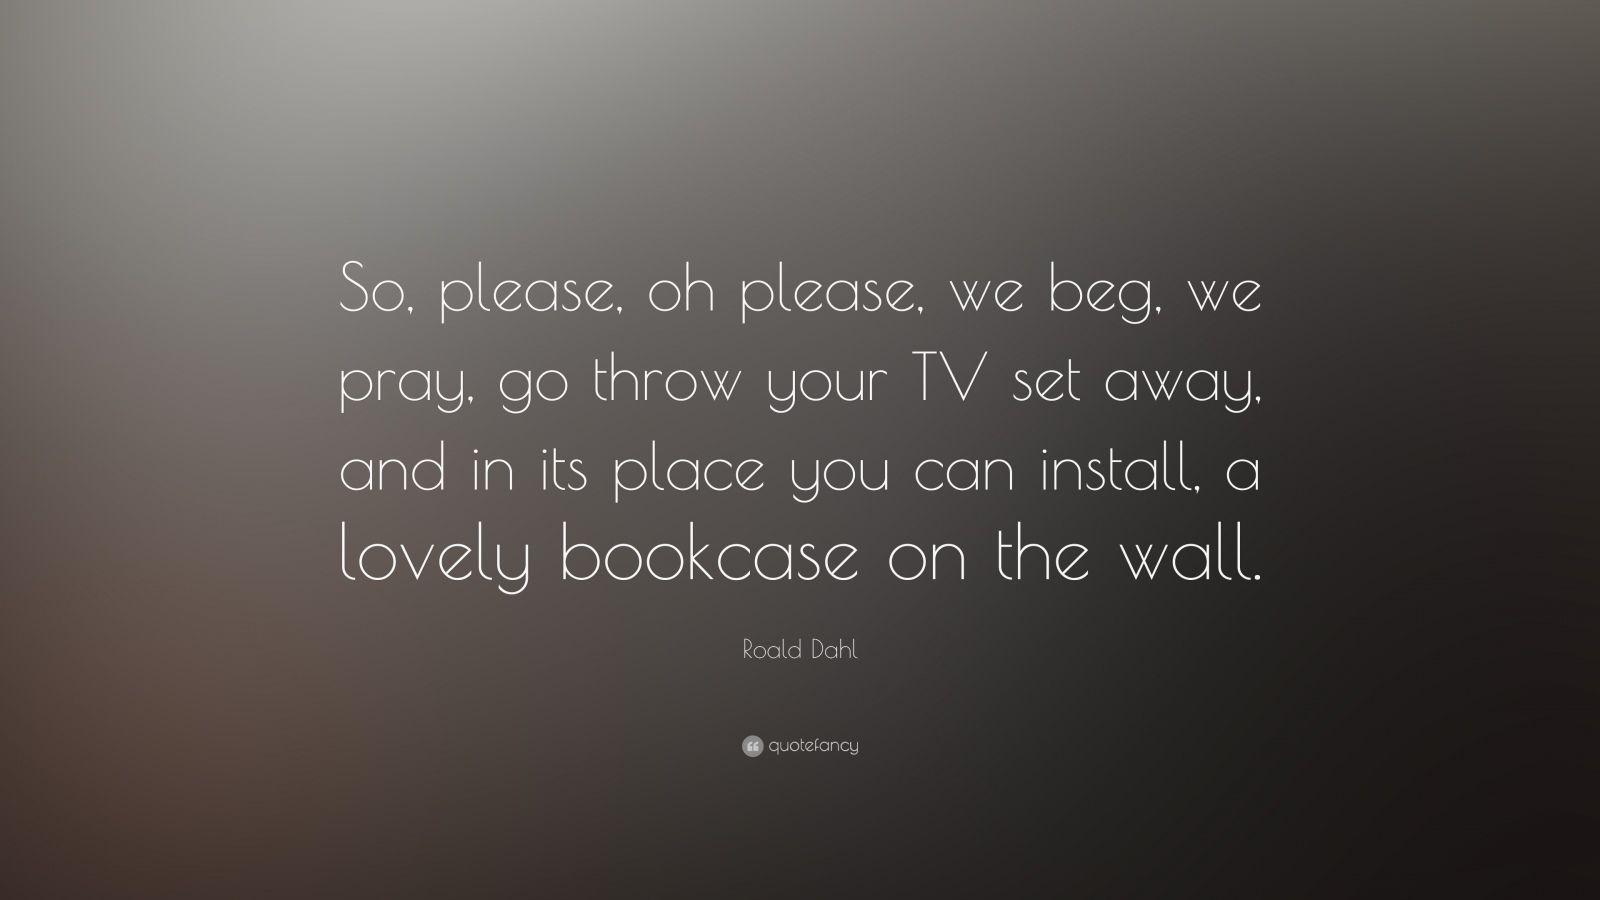 Roald Dahl Quotes Wallpaper Roald Dahl Quote So Please Oh Please We Beg We Pray